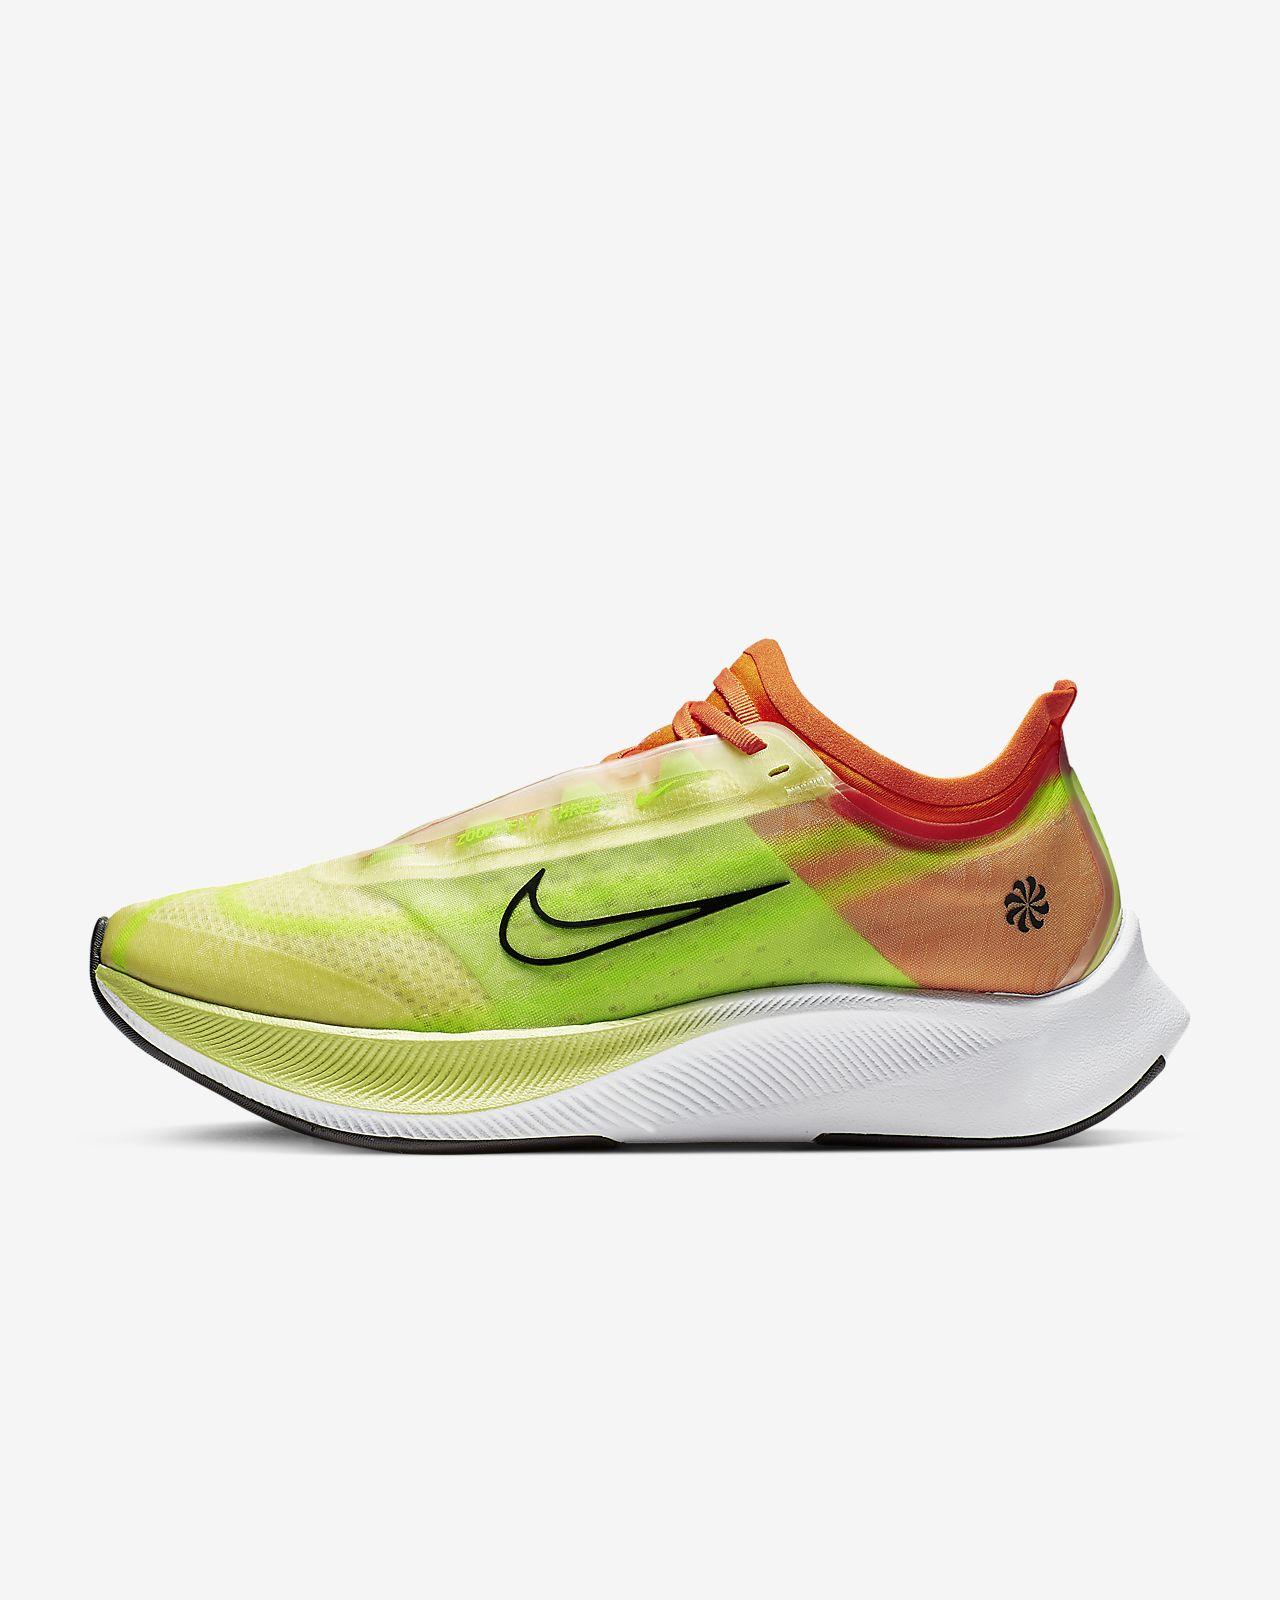 Da 3 Rise Fly Running Donnait Scarpa Zoom Thdxqrsc Nike MSzpqUV